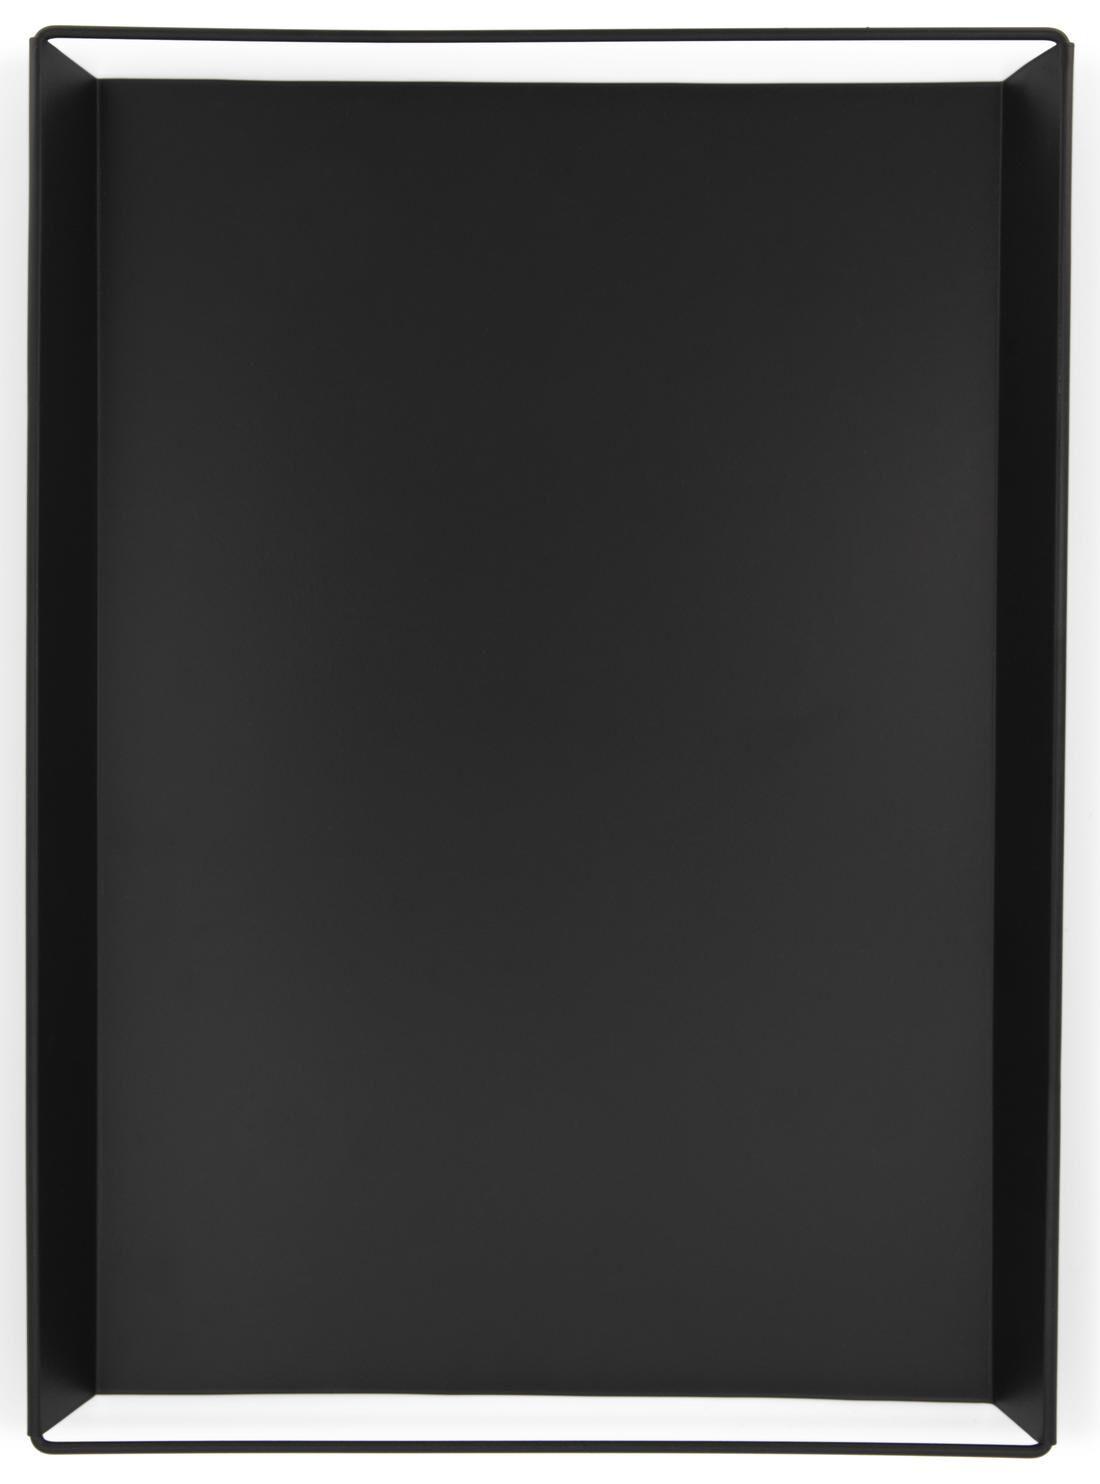 HEMA Kaarsplateau - 22 X 45.5 X 3 Cm - Zwart (zwart)